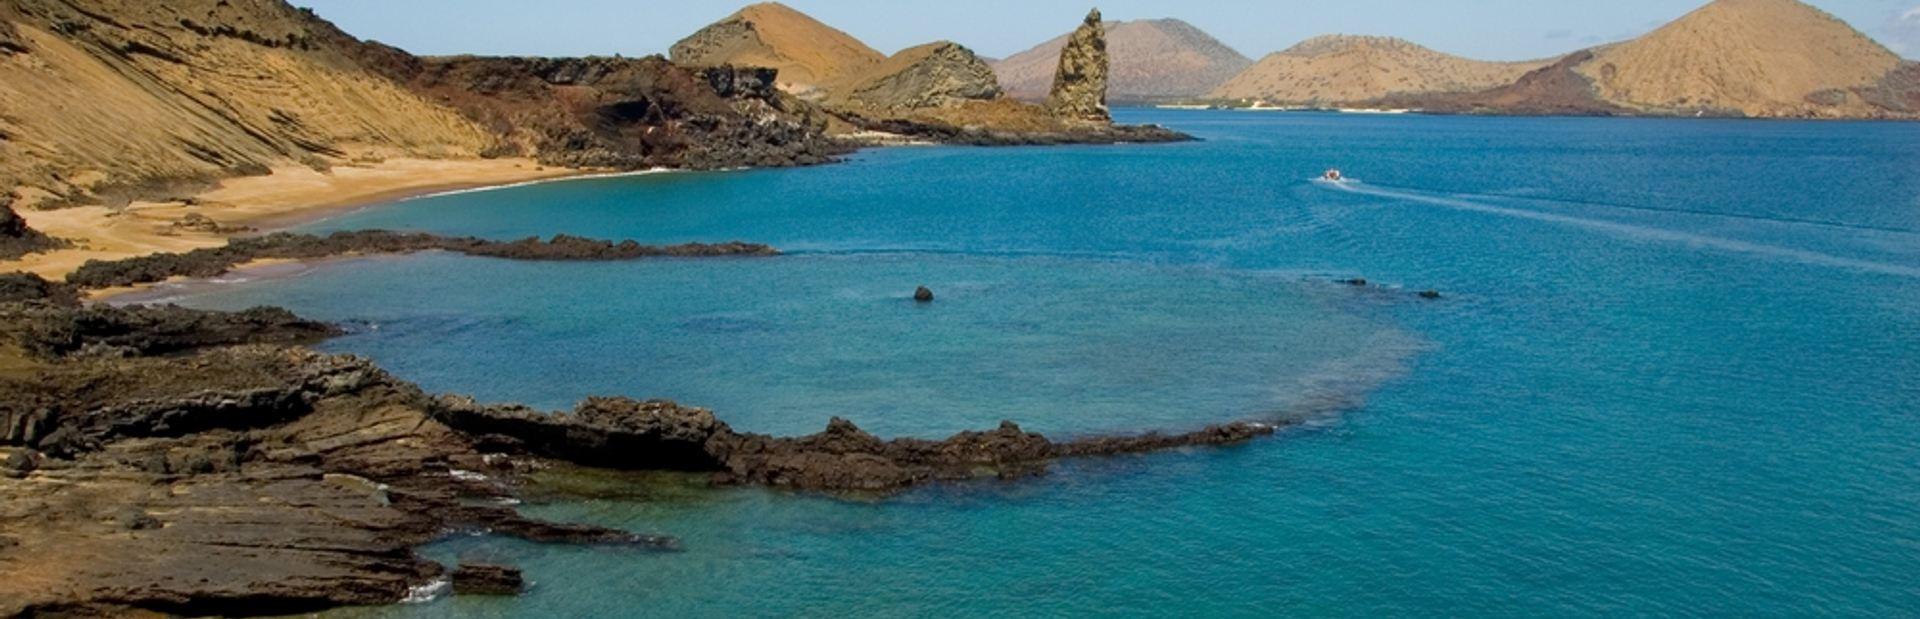 Galapagos Islands inspiration and tips